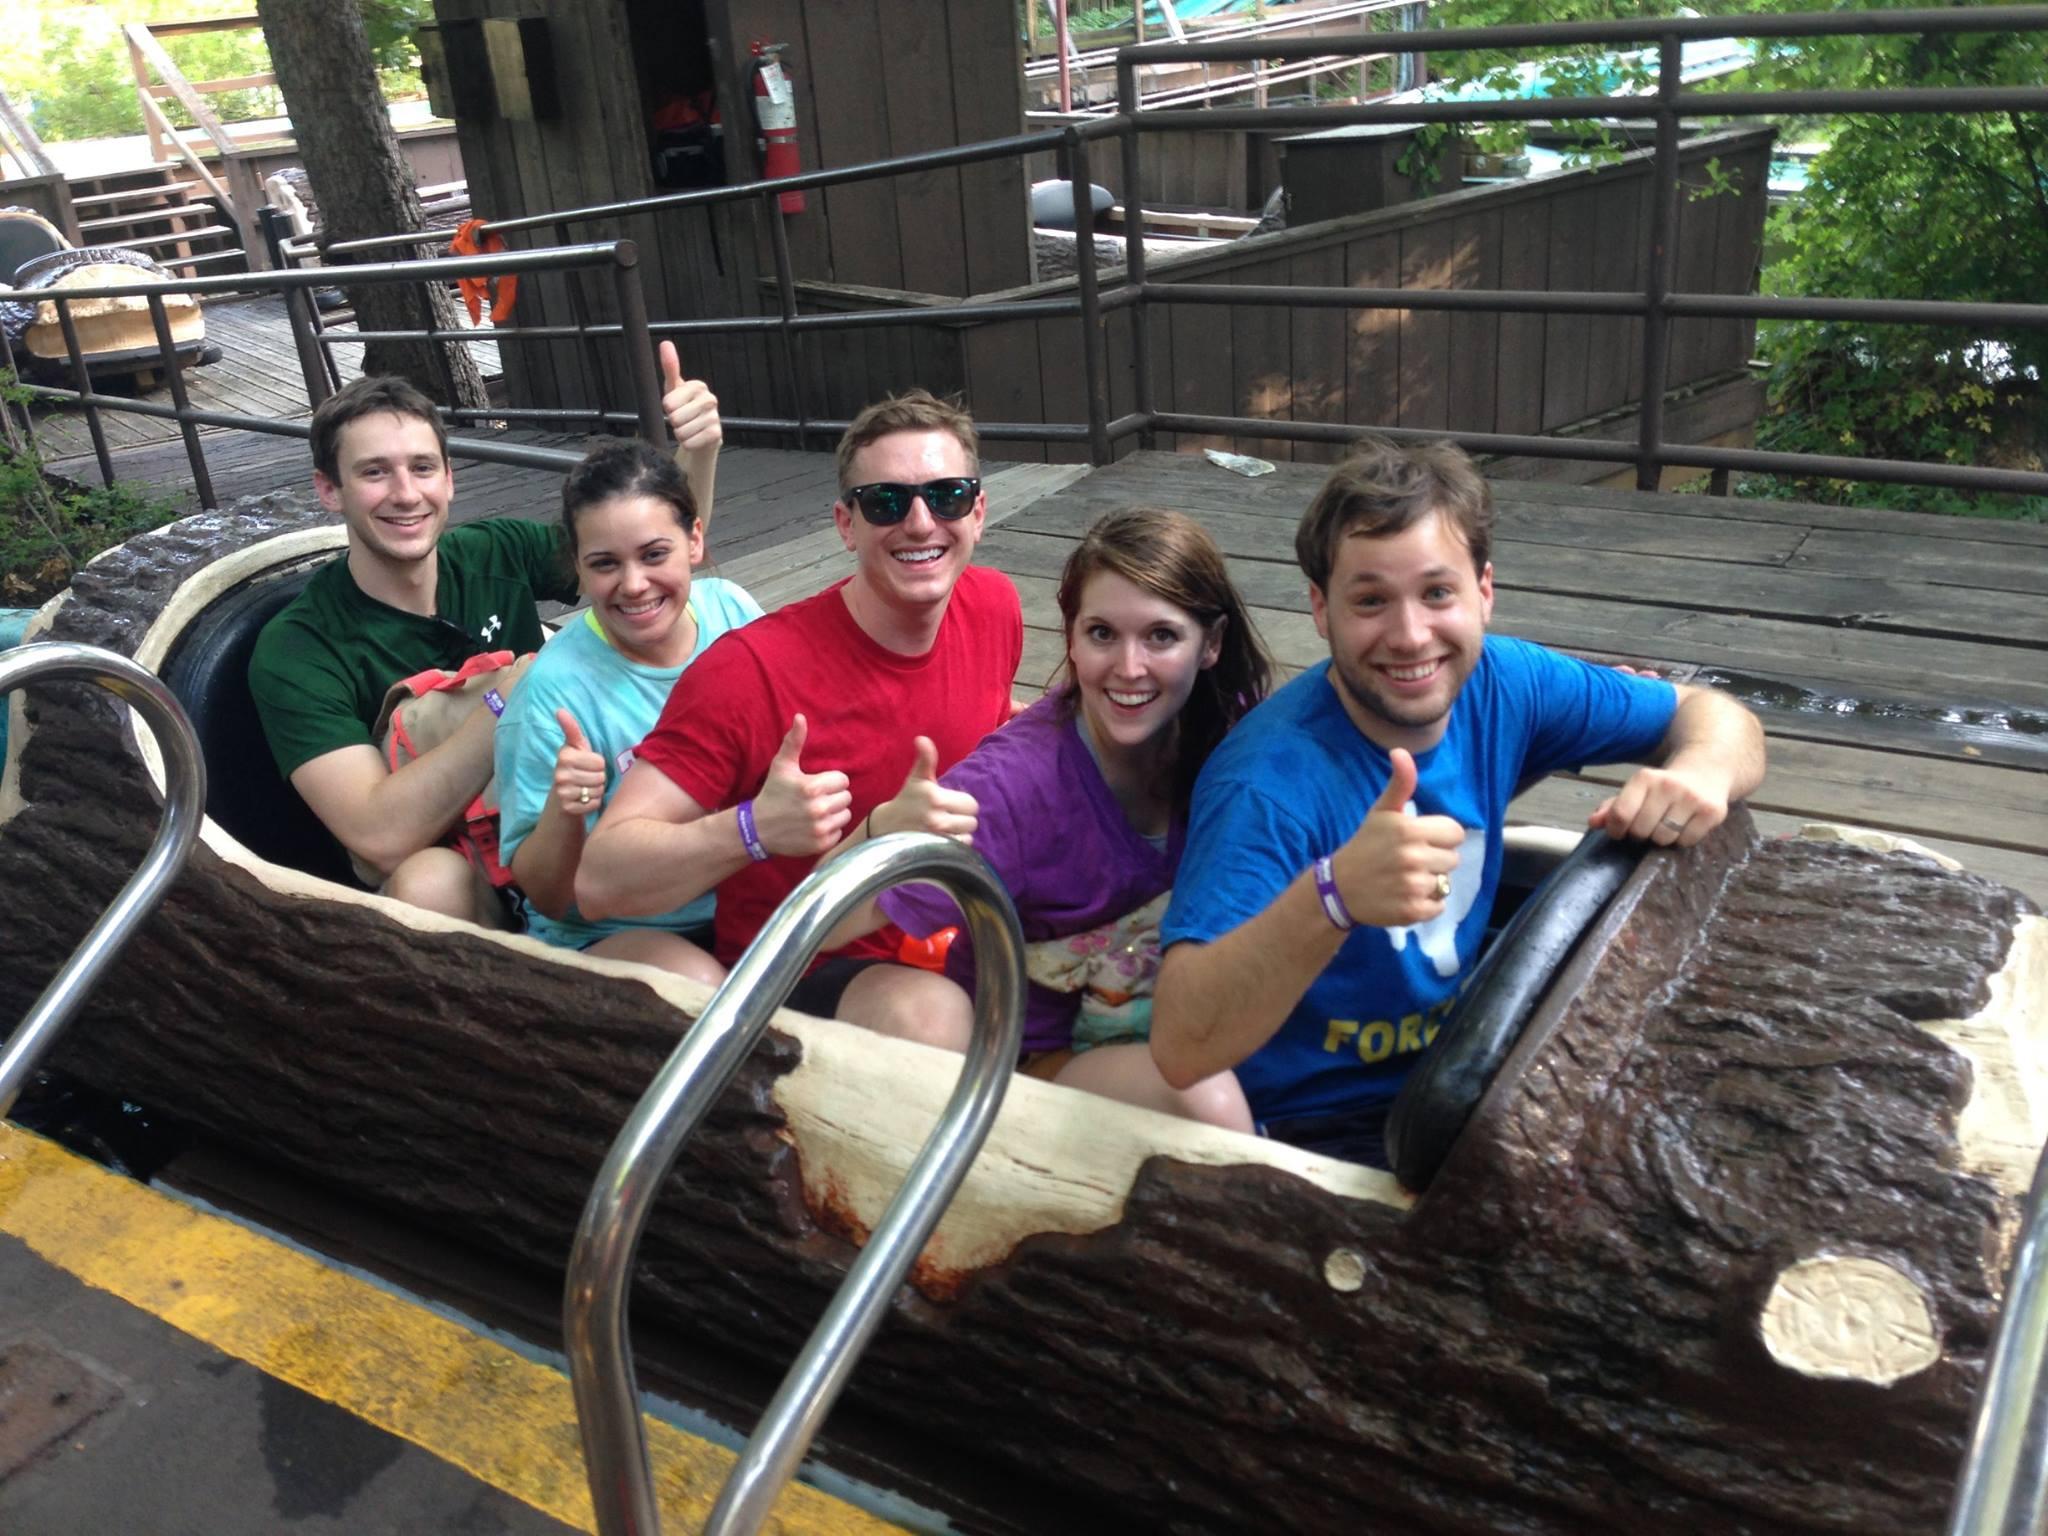 Log Ride Fun!